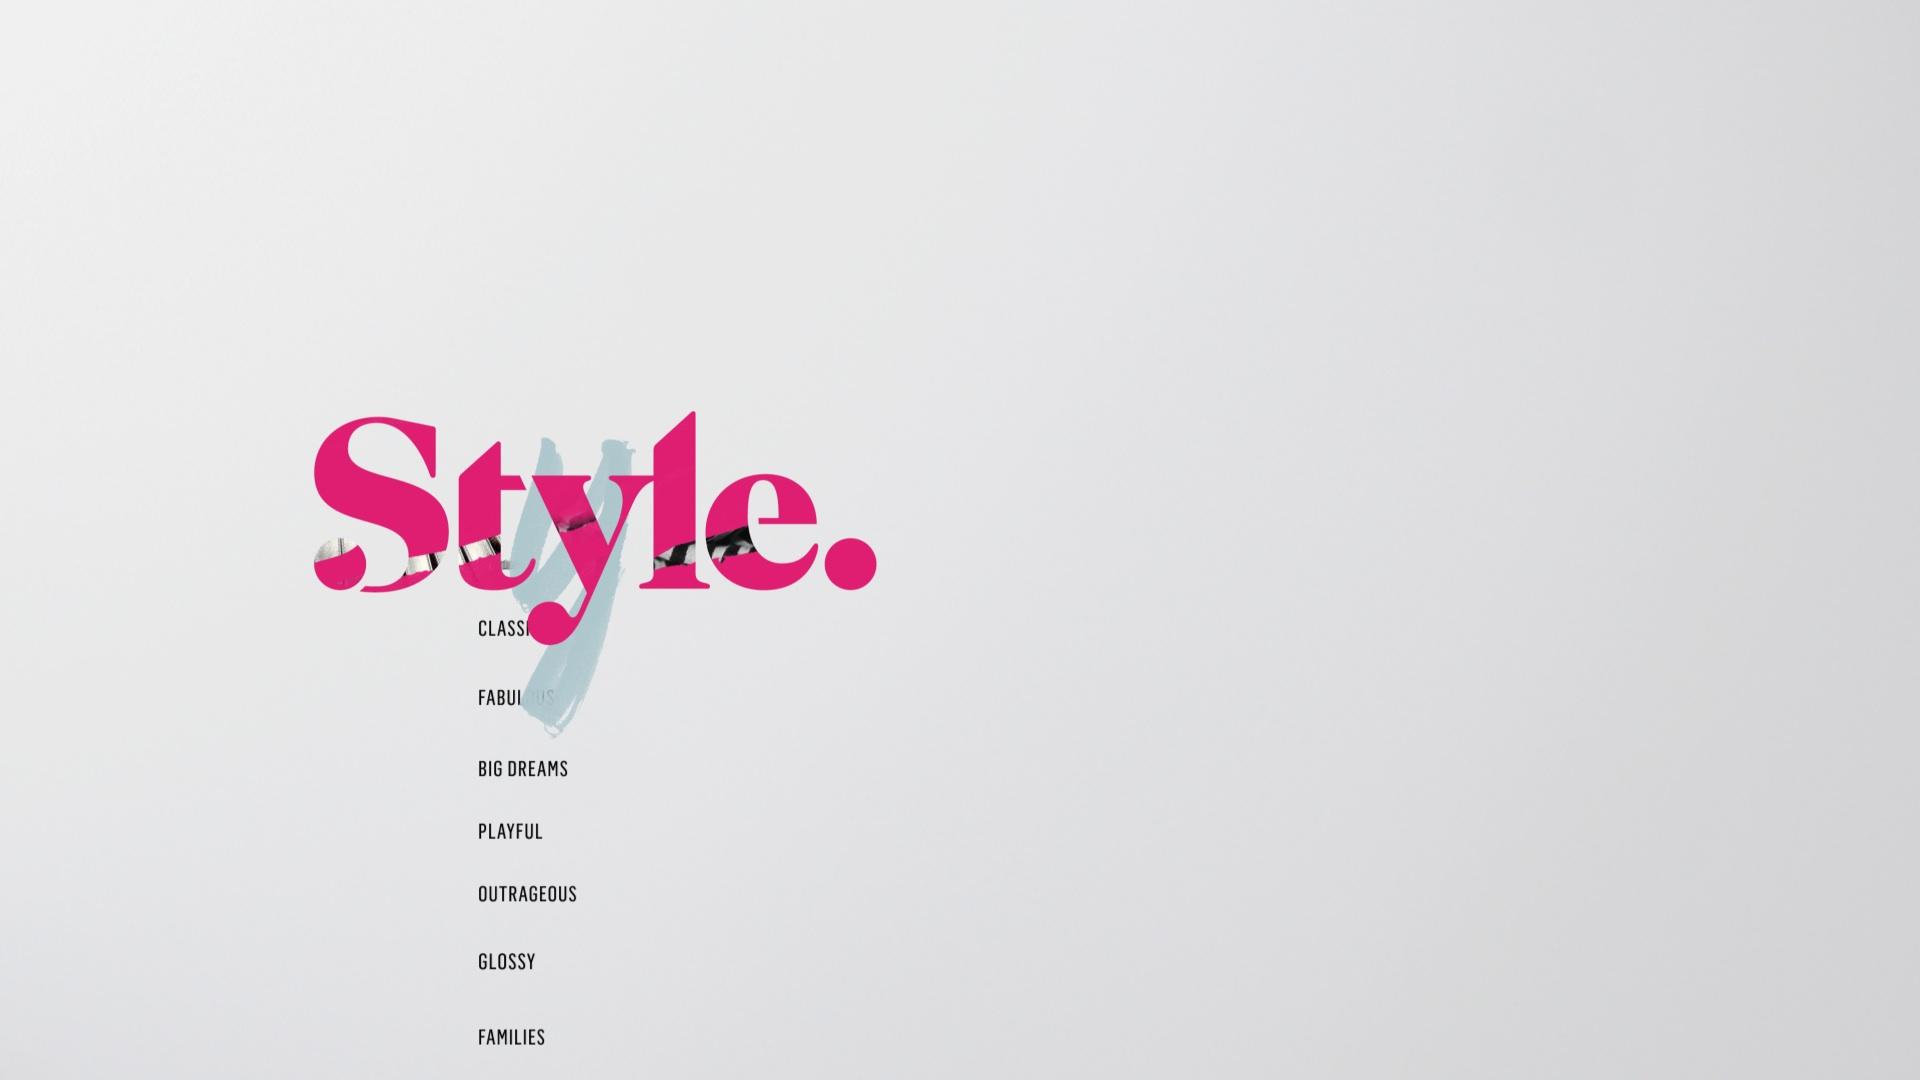 UPFRONTS - STYLE NETWORK